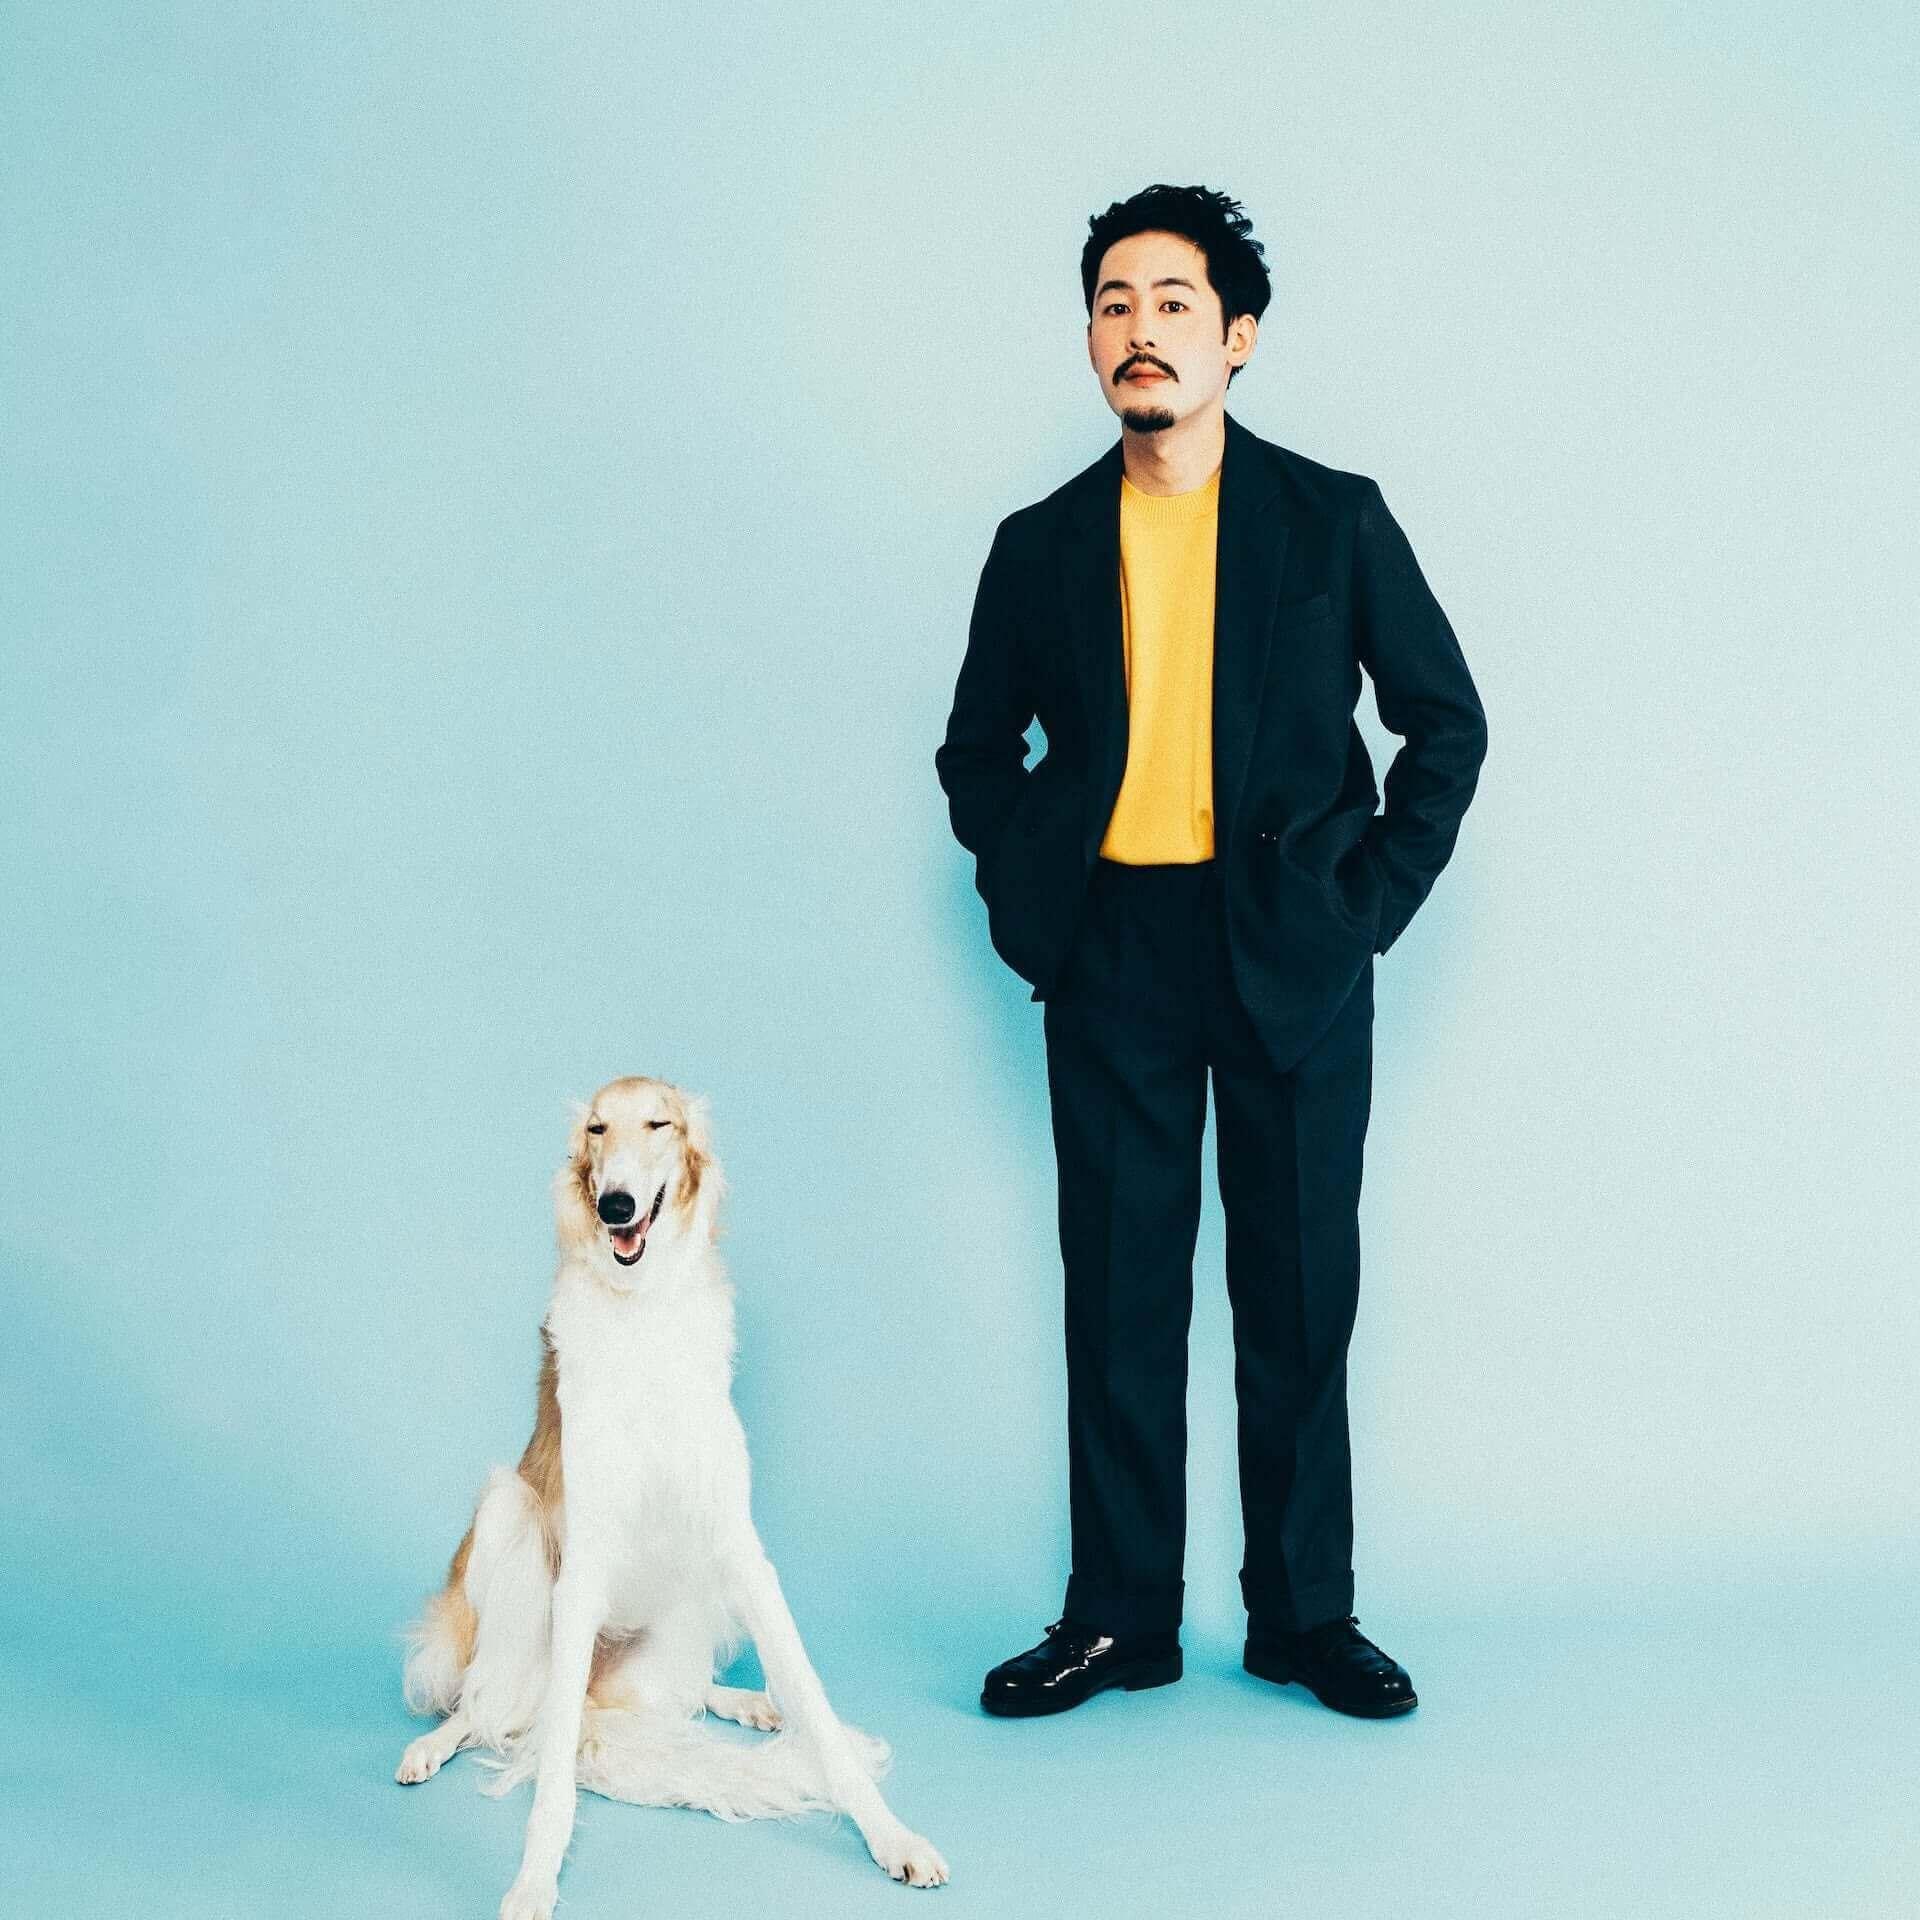 TENDREの新アルバム『LIFE LESS LONELY』にKing Gnu・新井和輝とKANDYTOWNのRyohuが参加決定! music2000825_tendre_2-1920x1920